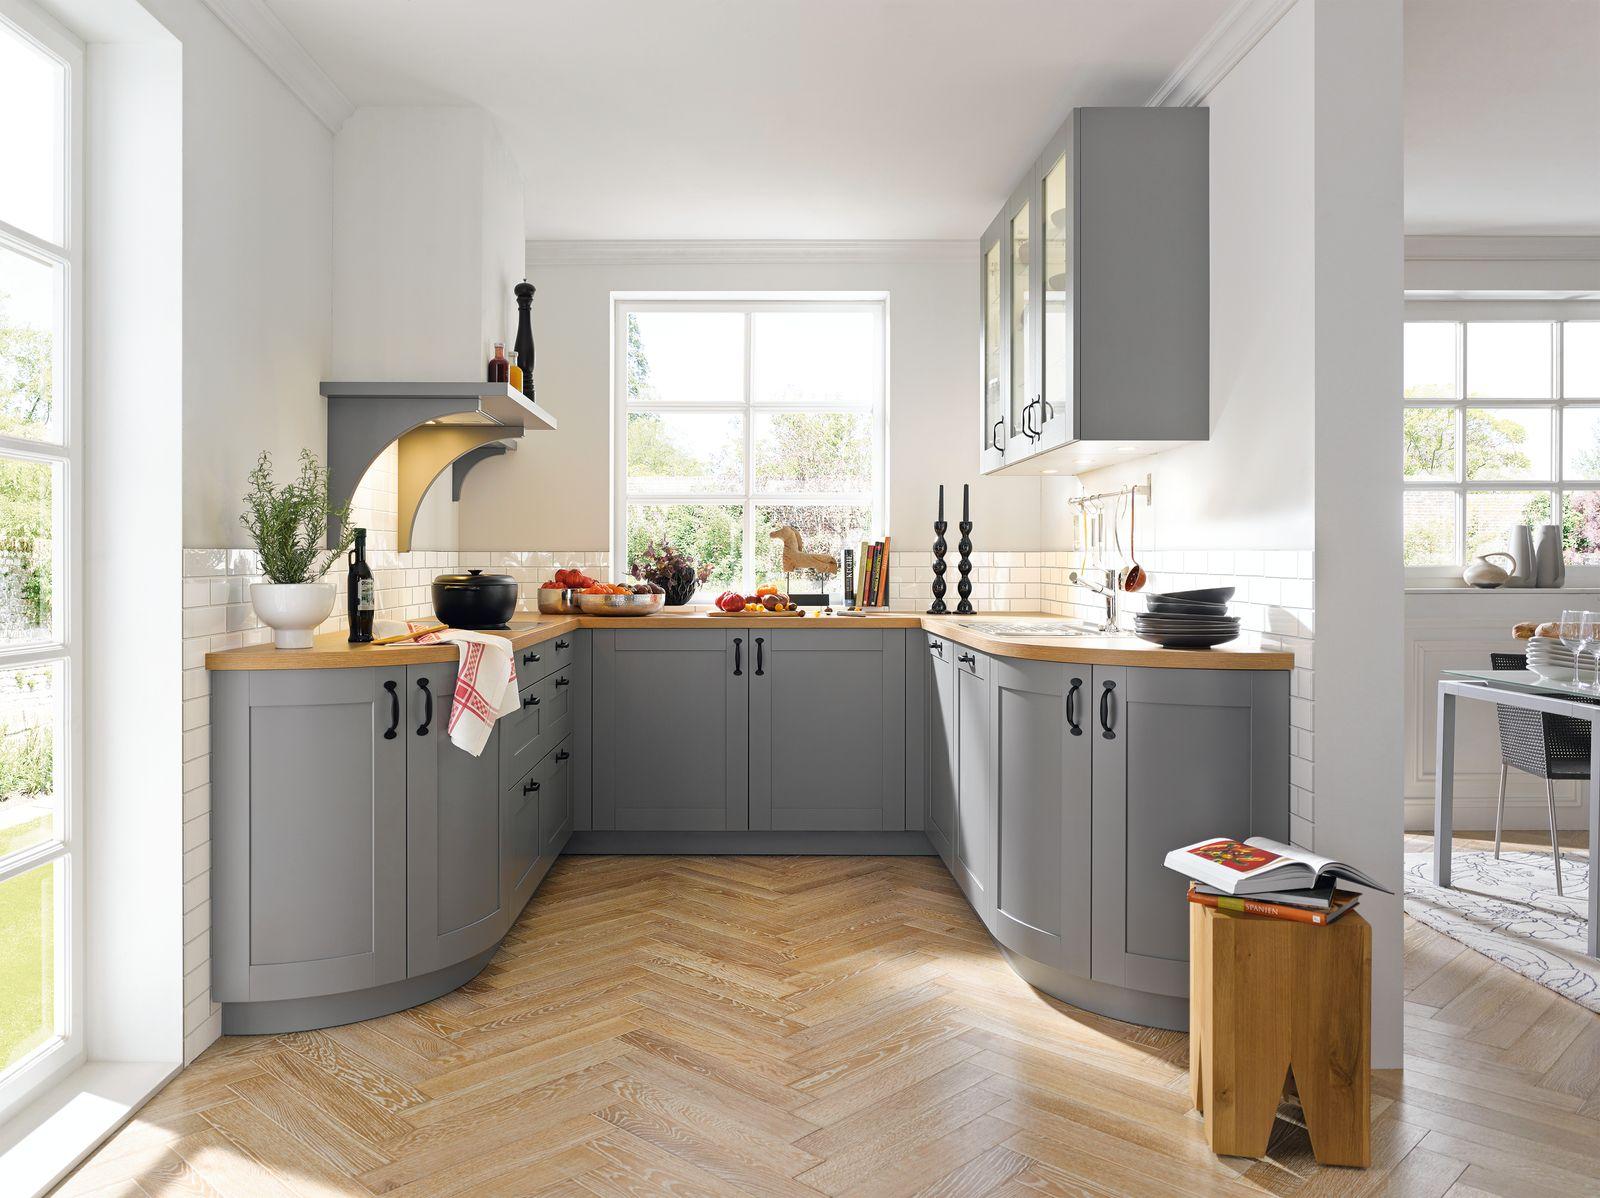 casa ach t ed hedv bn leskl kuchyn sch ller nexttradestore. Black Bedroom Furniture Sets. Home Design Ideas